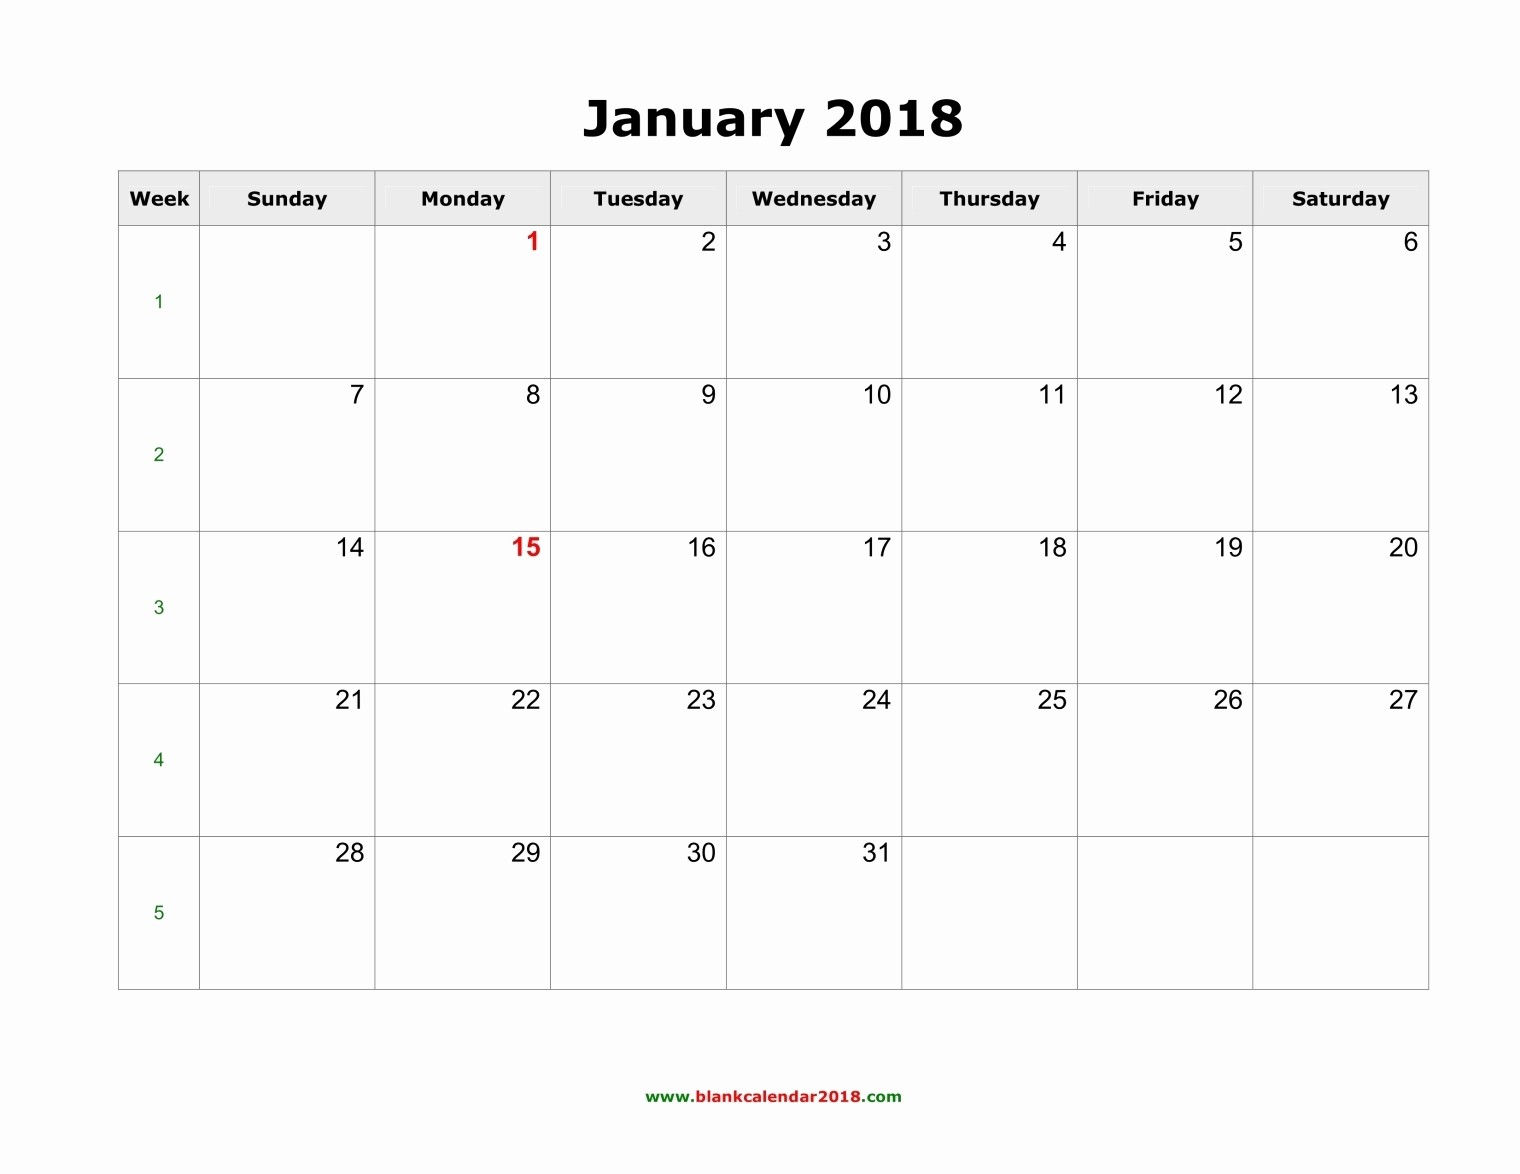 12 Month Calendar 2018 Printable Best Of 12 Month 2018 Calendar Printable Zoro Blaszczak